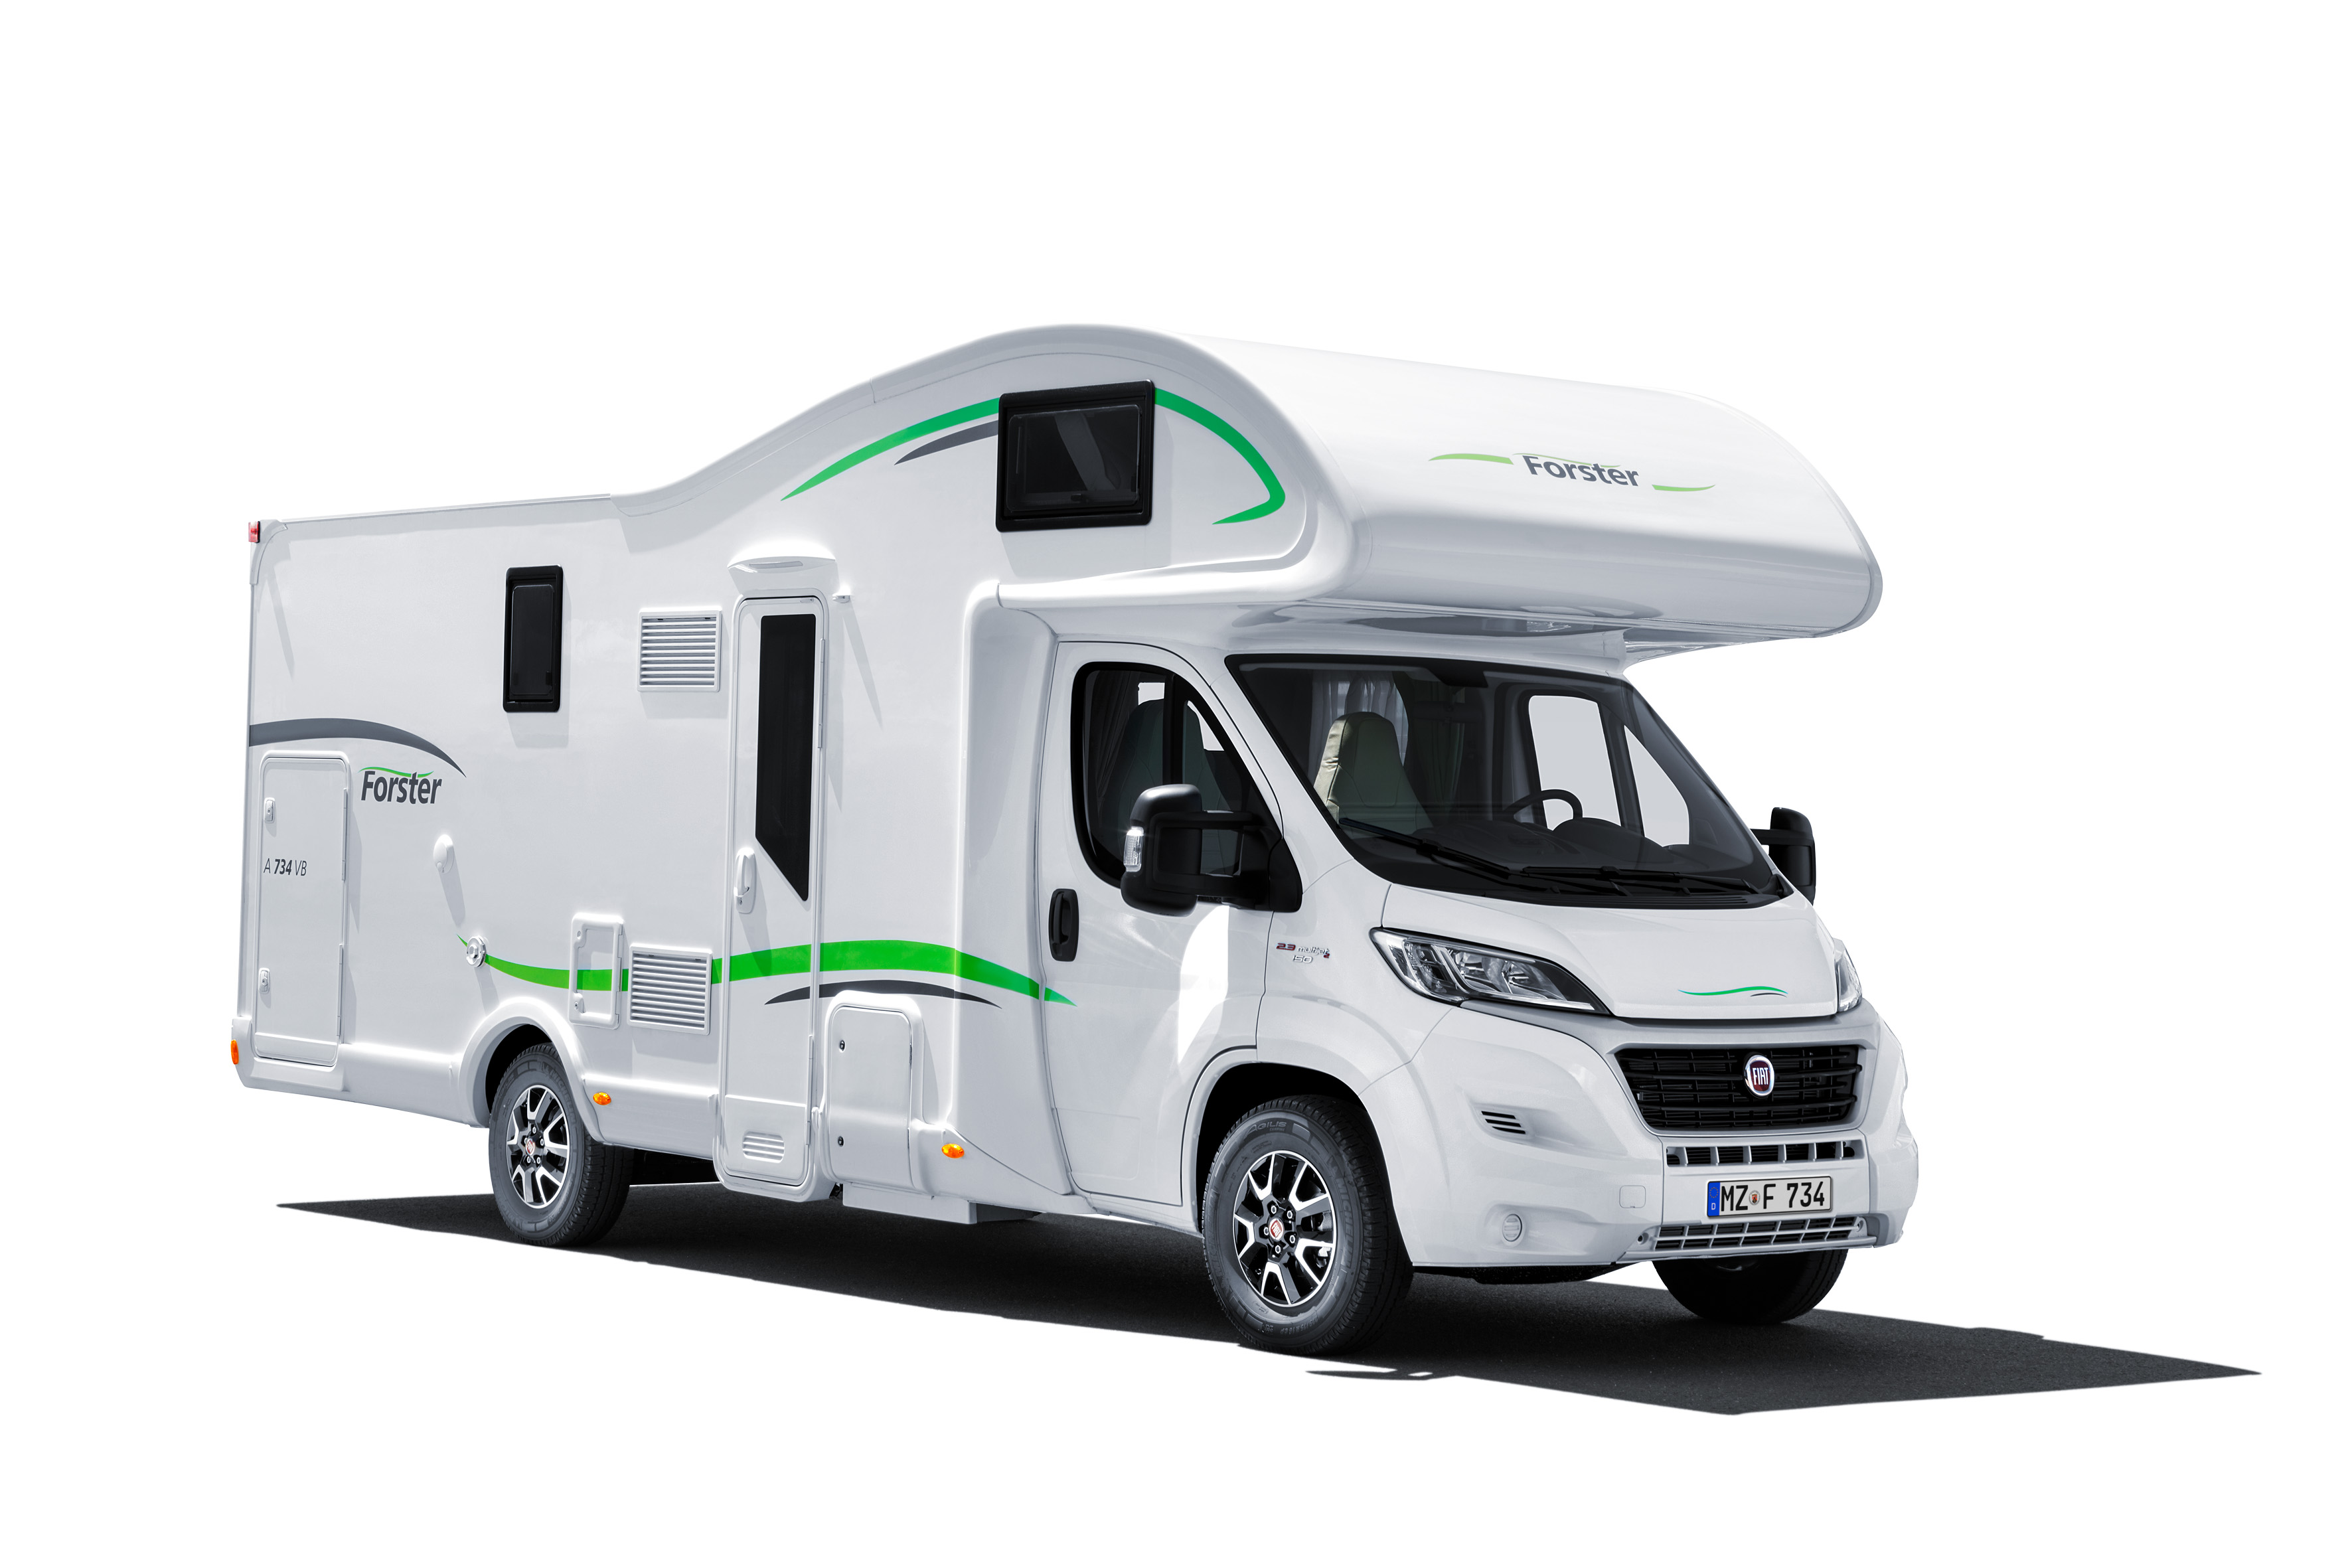 Wohnmobil Forster A 699 VB Modell 2018